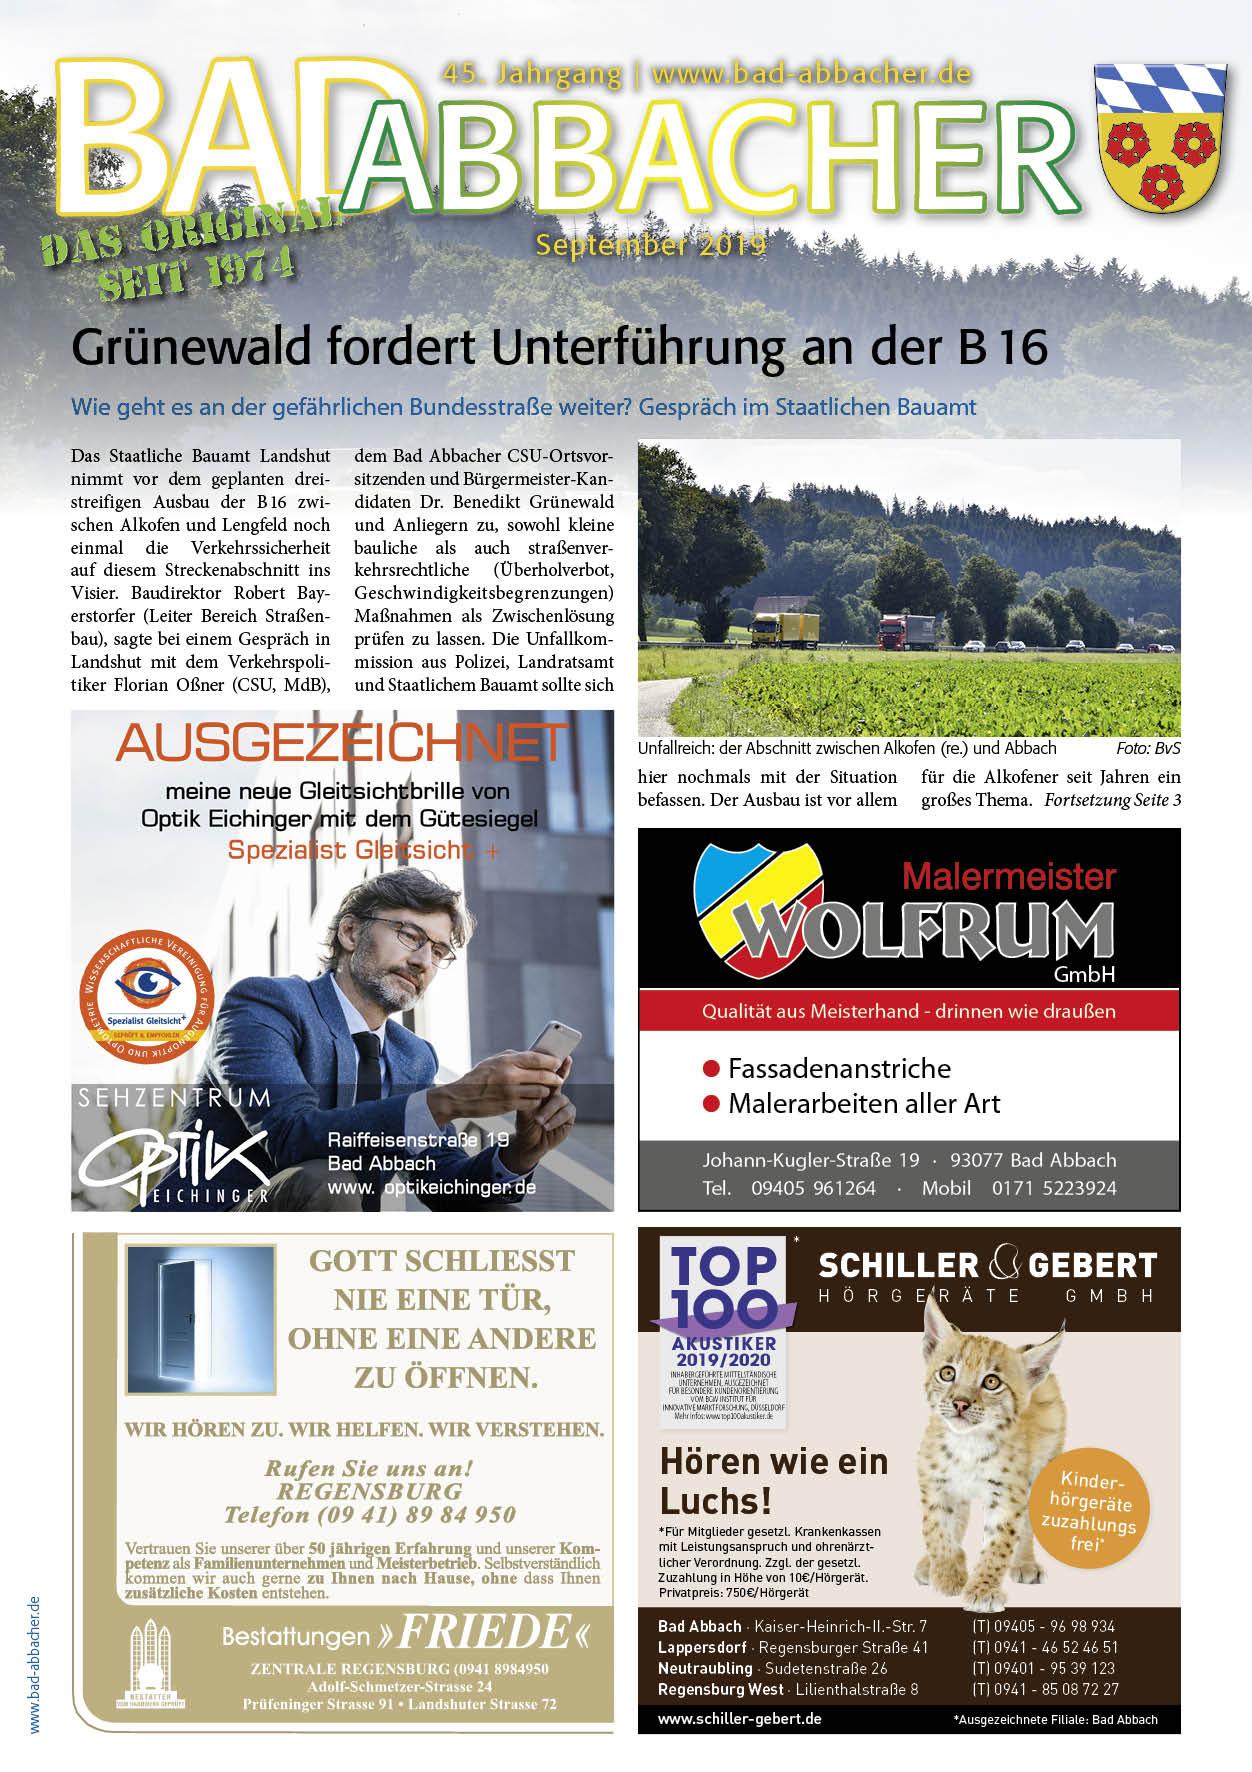 Bad-Abbacher_2019-09